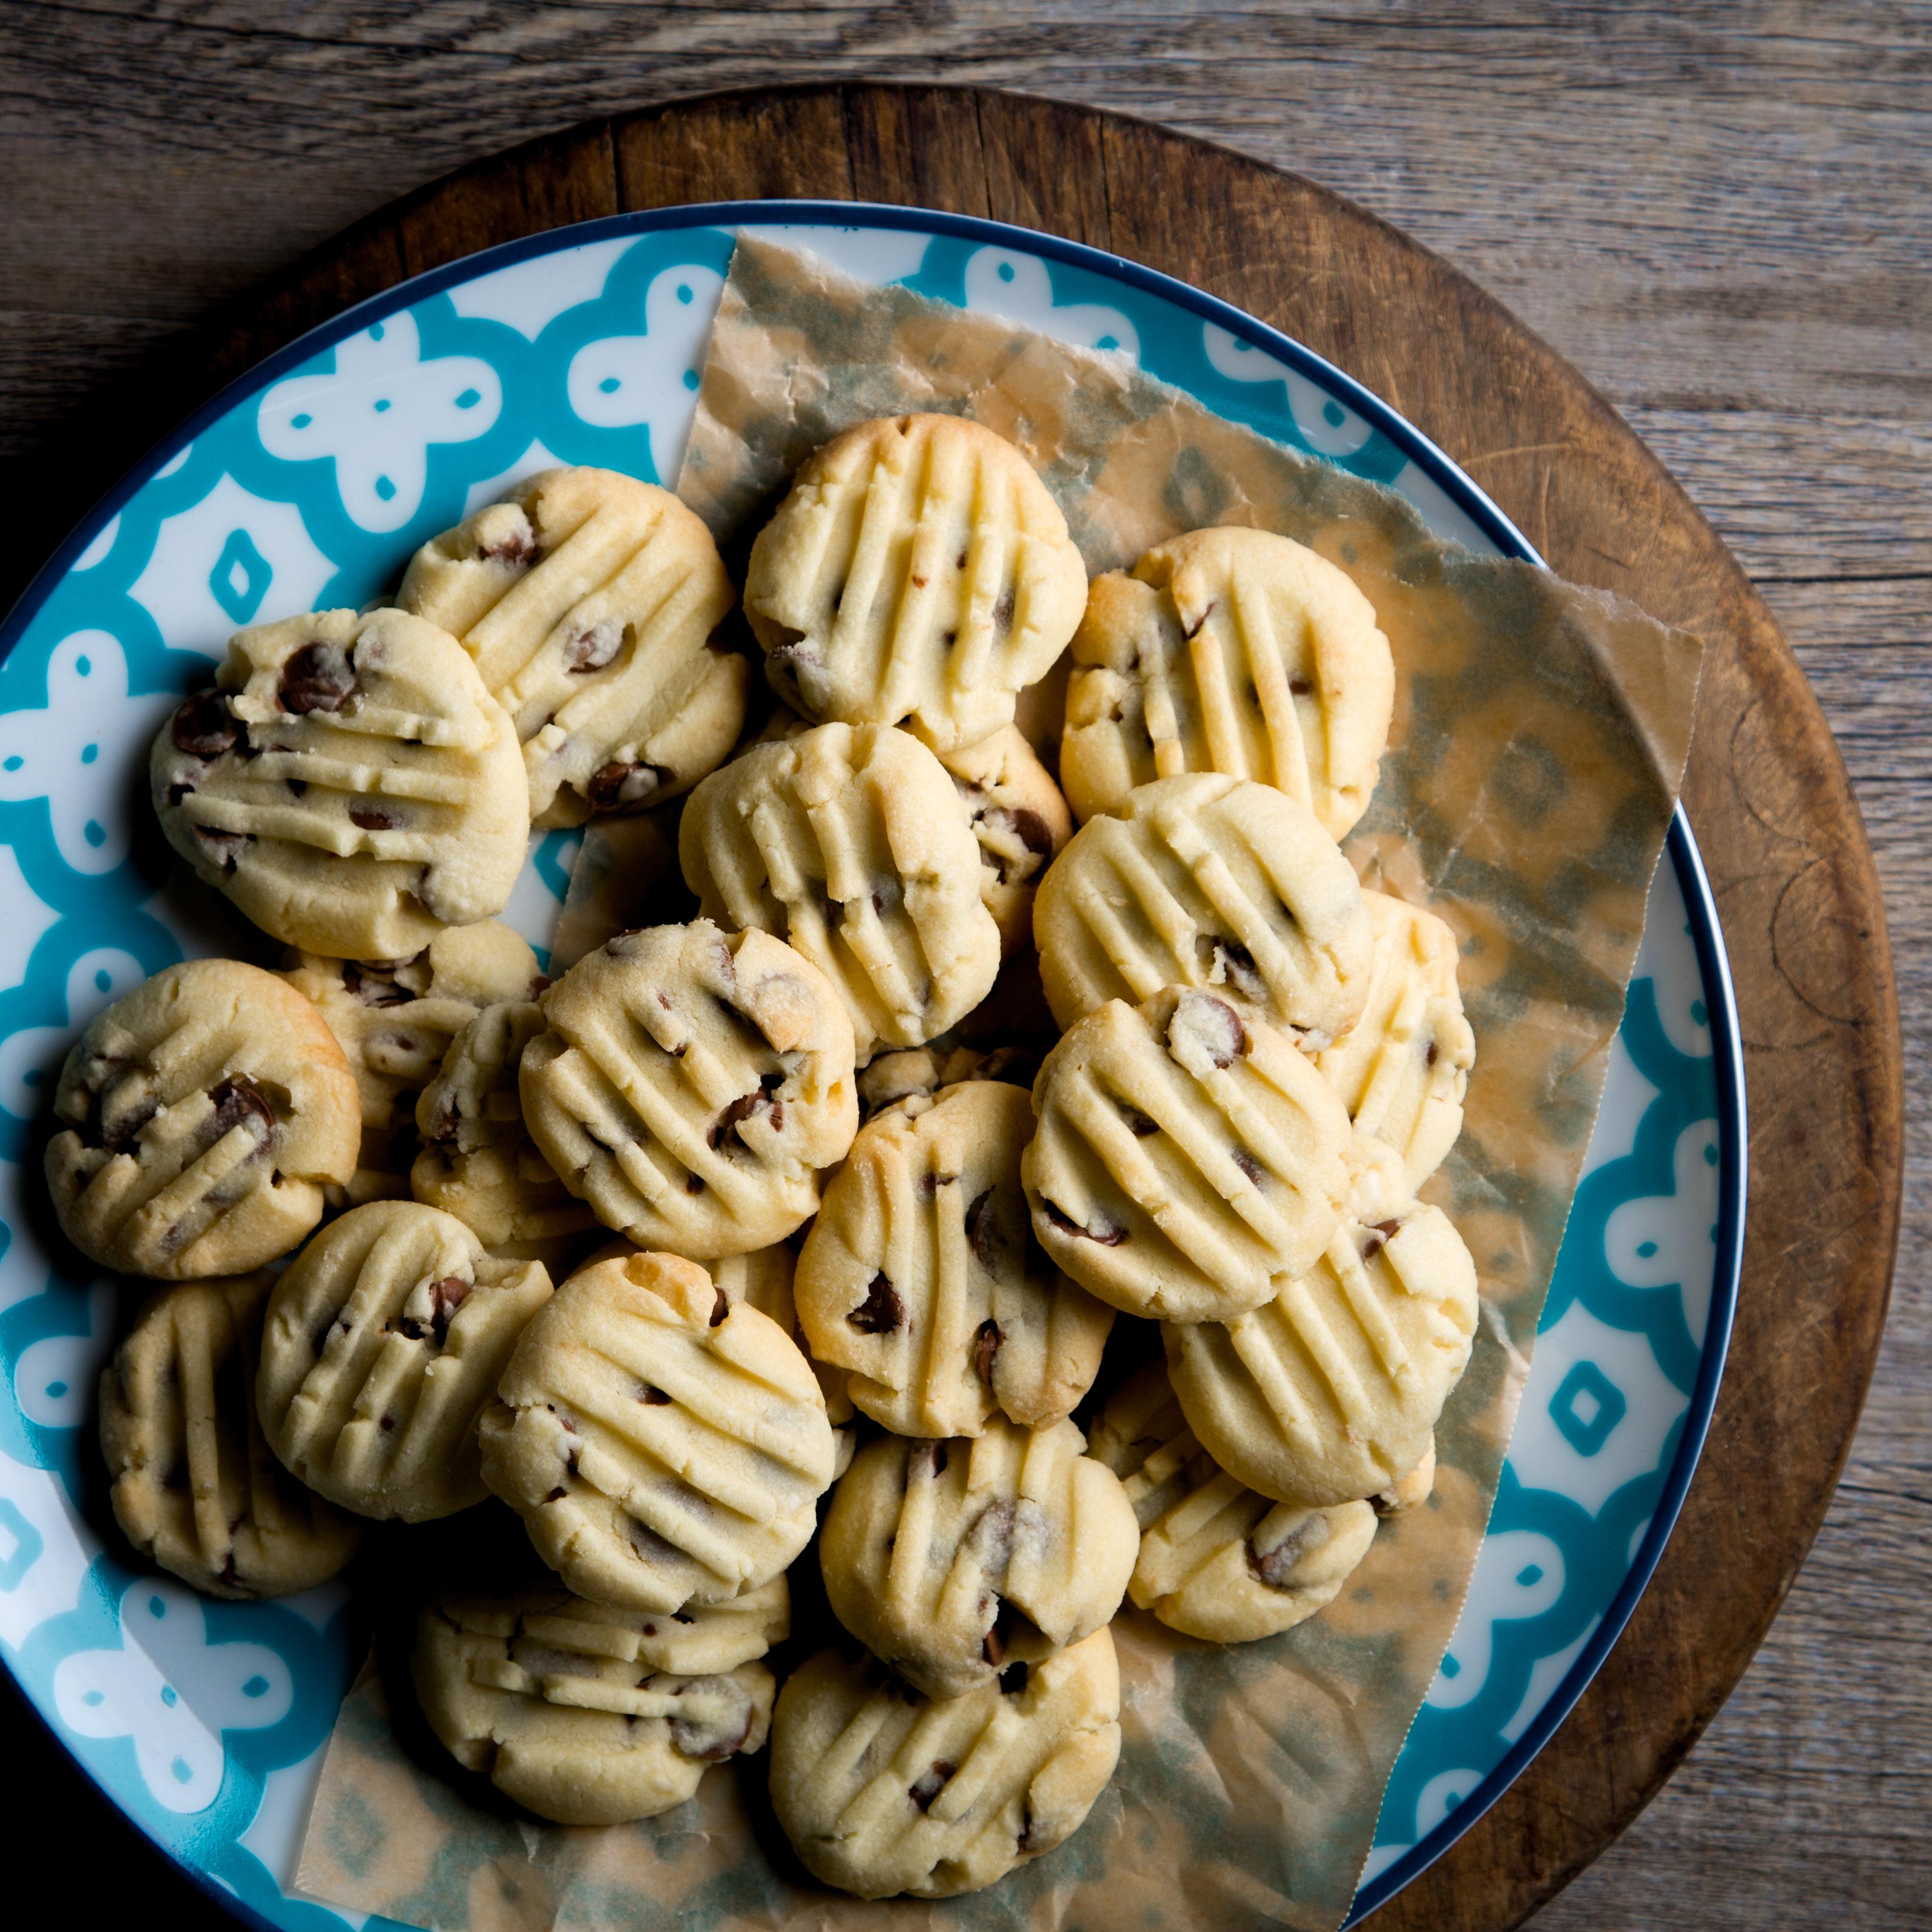 magimix-cook-expert-choc-chip-shortbread-cookies